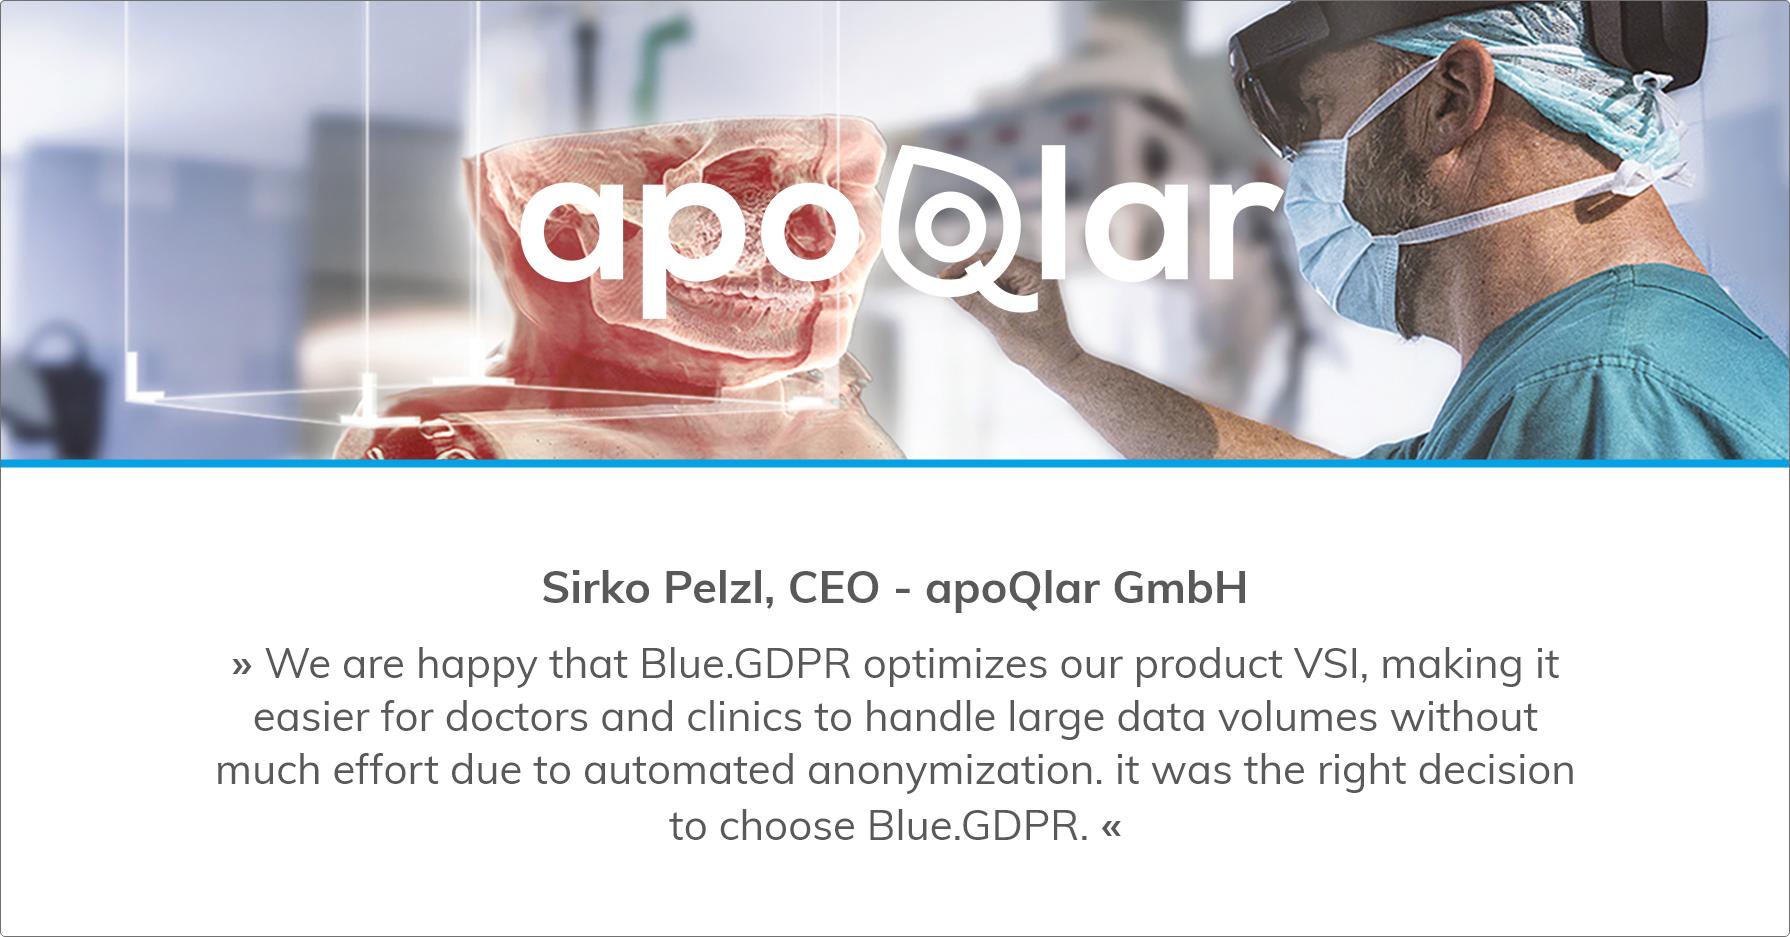 Sirko Pelzl, CEO - apoQlar GmbH